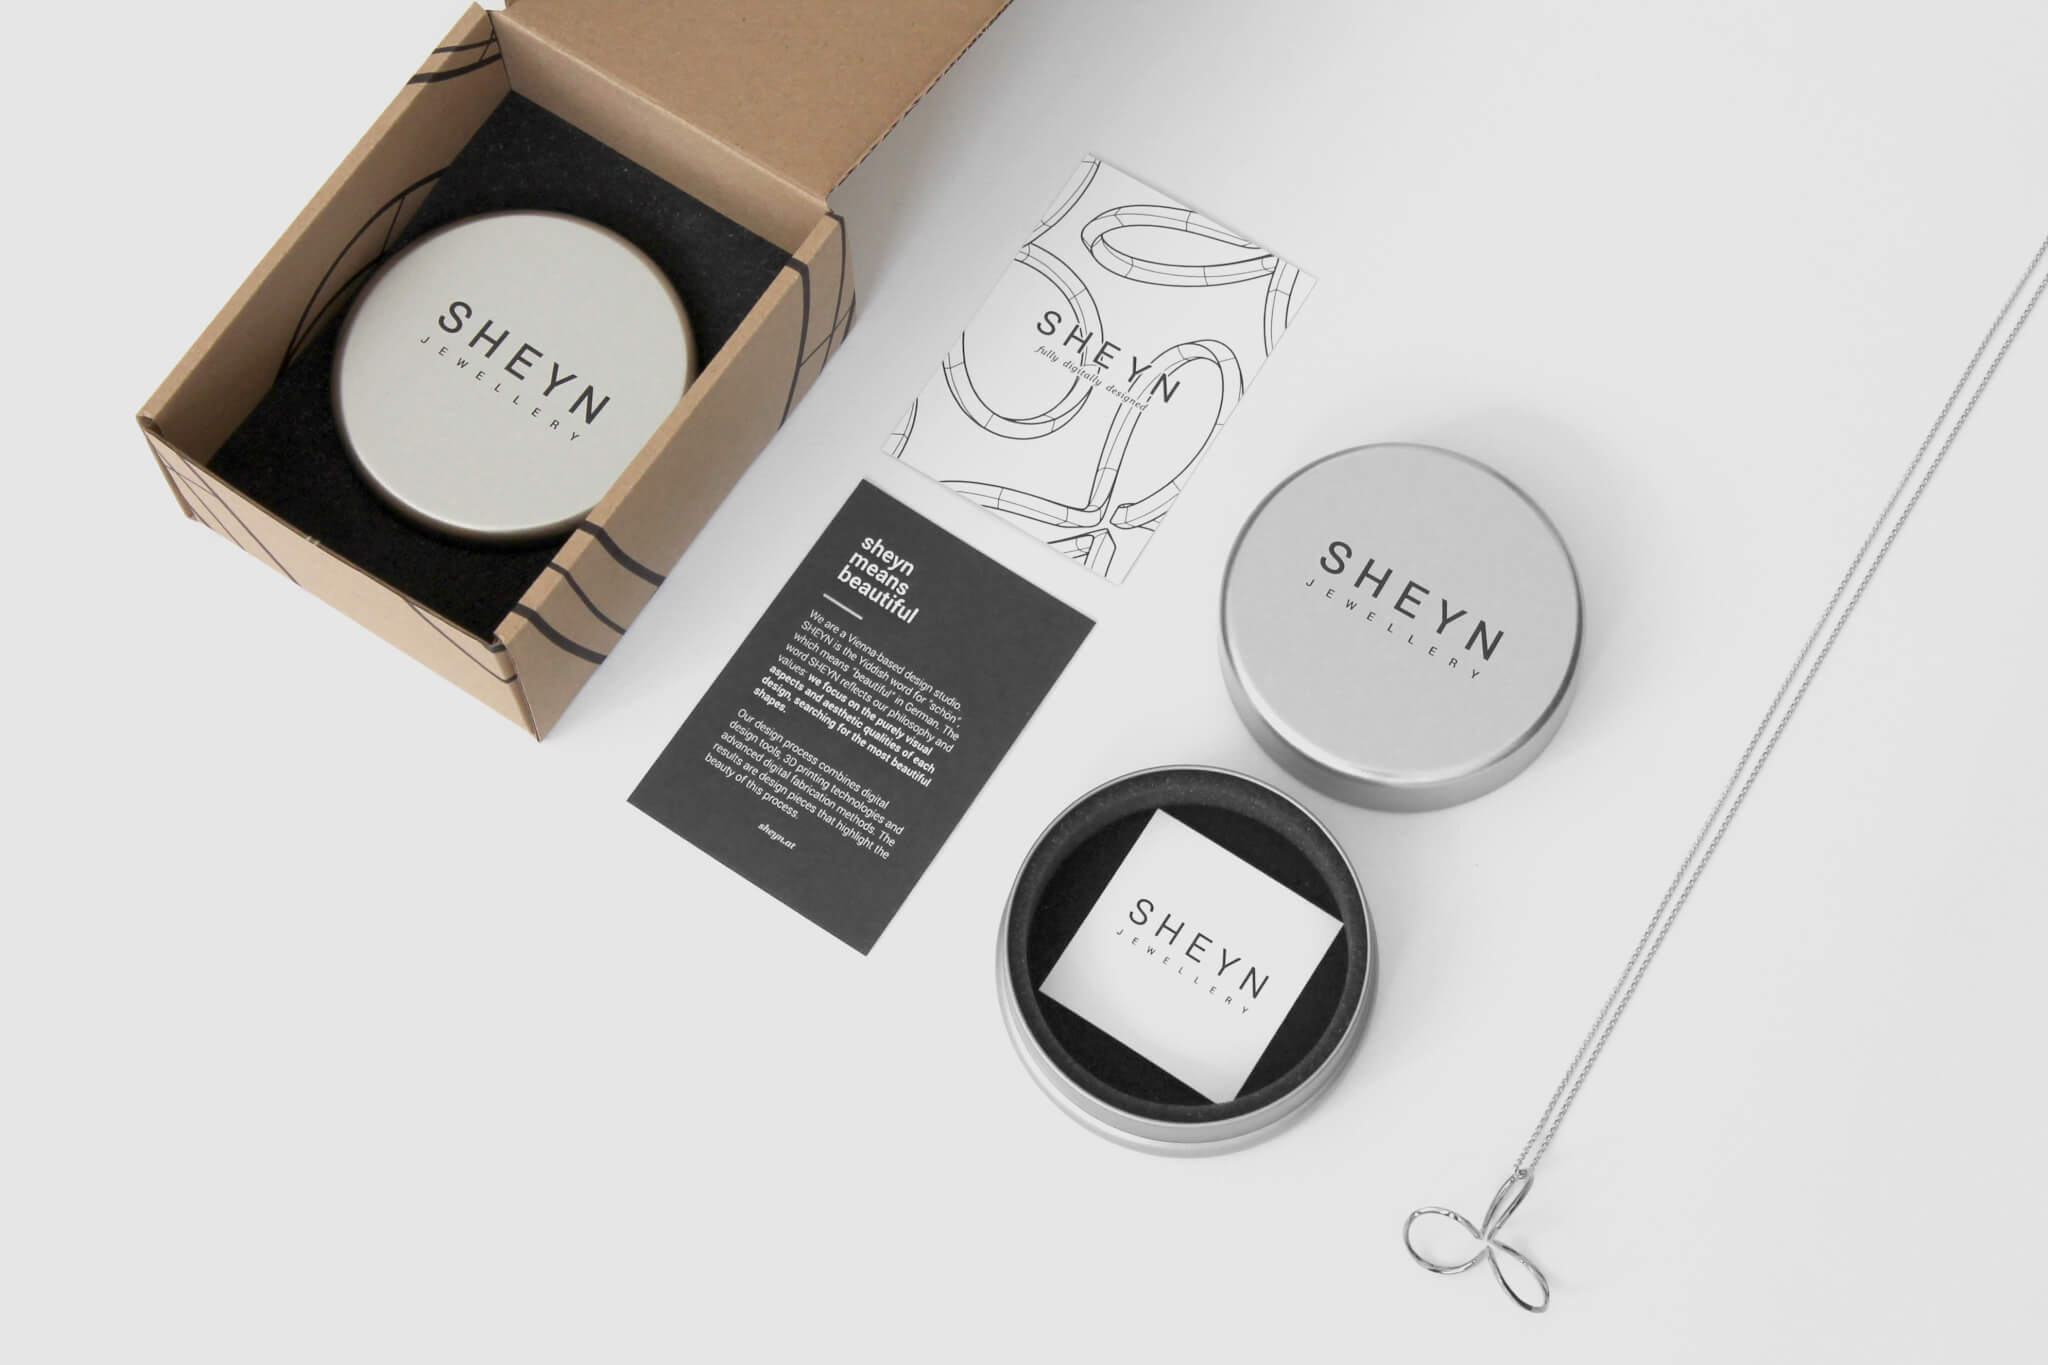 SHEYN packaging design